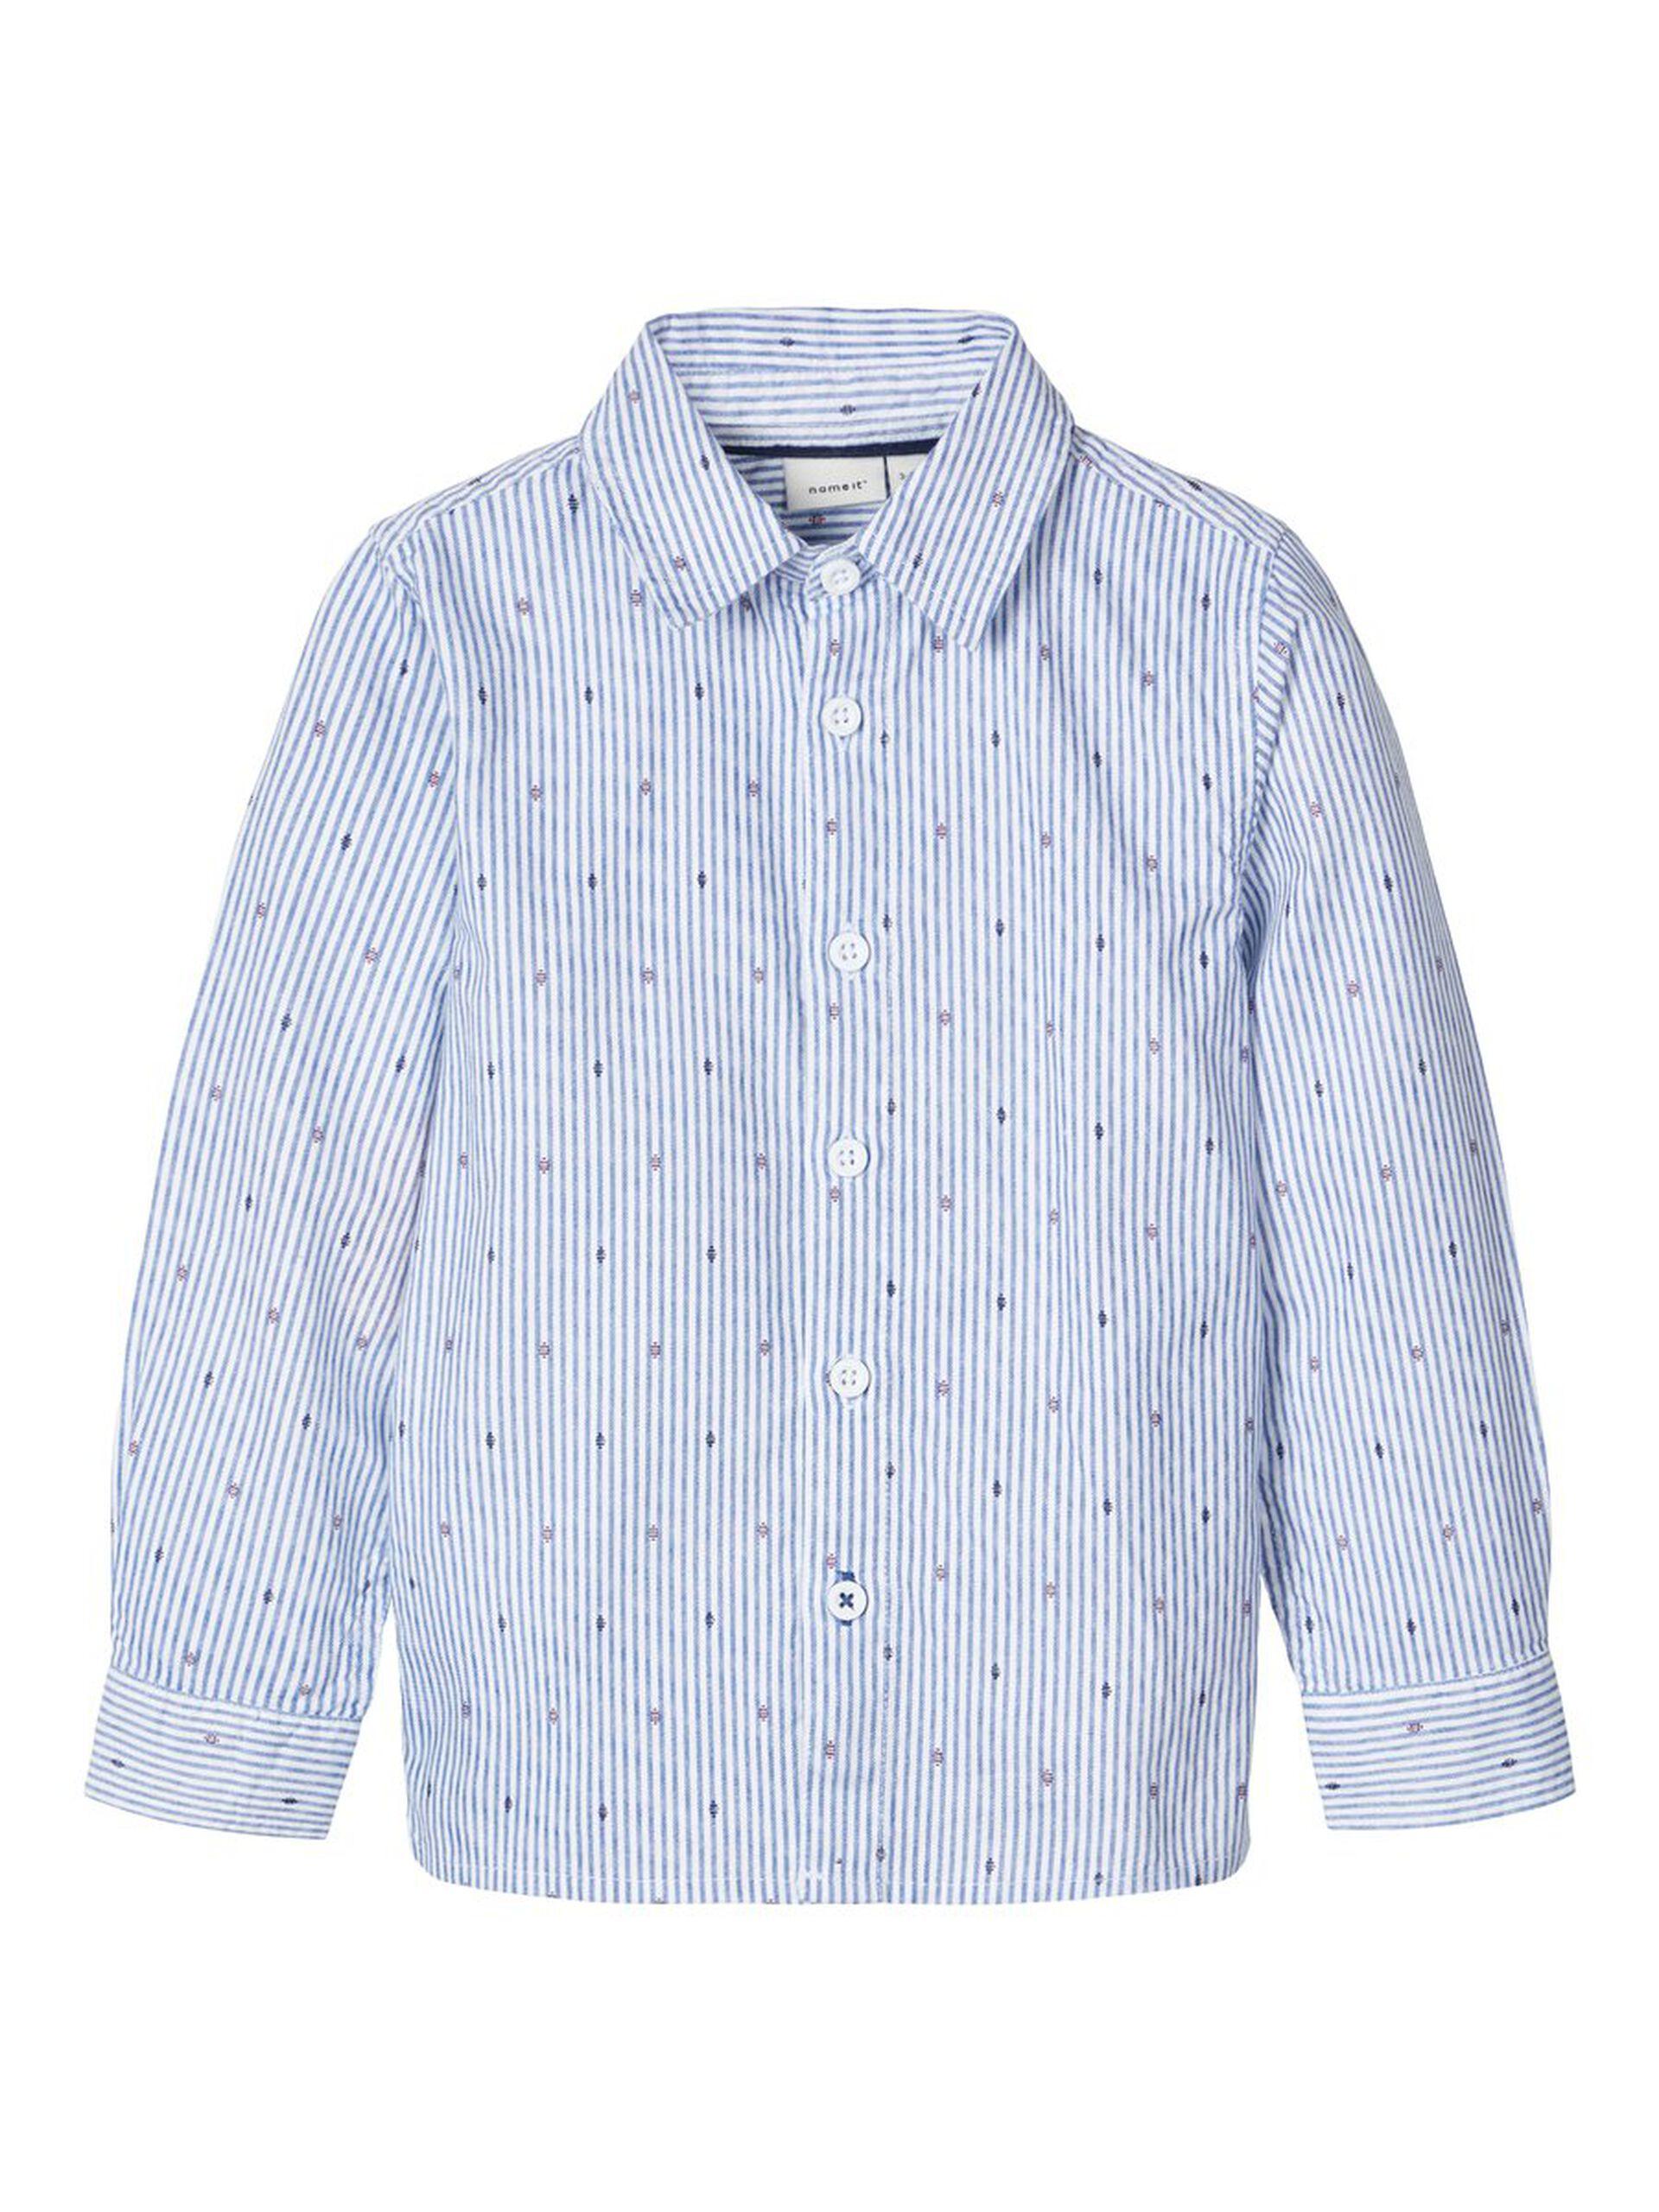 skjorte med ruter og denim MioTrend